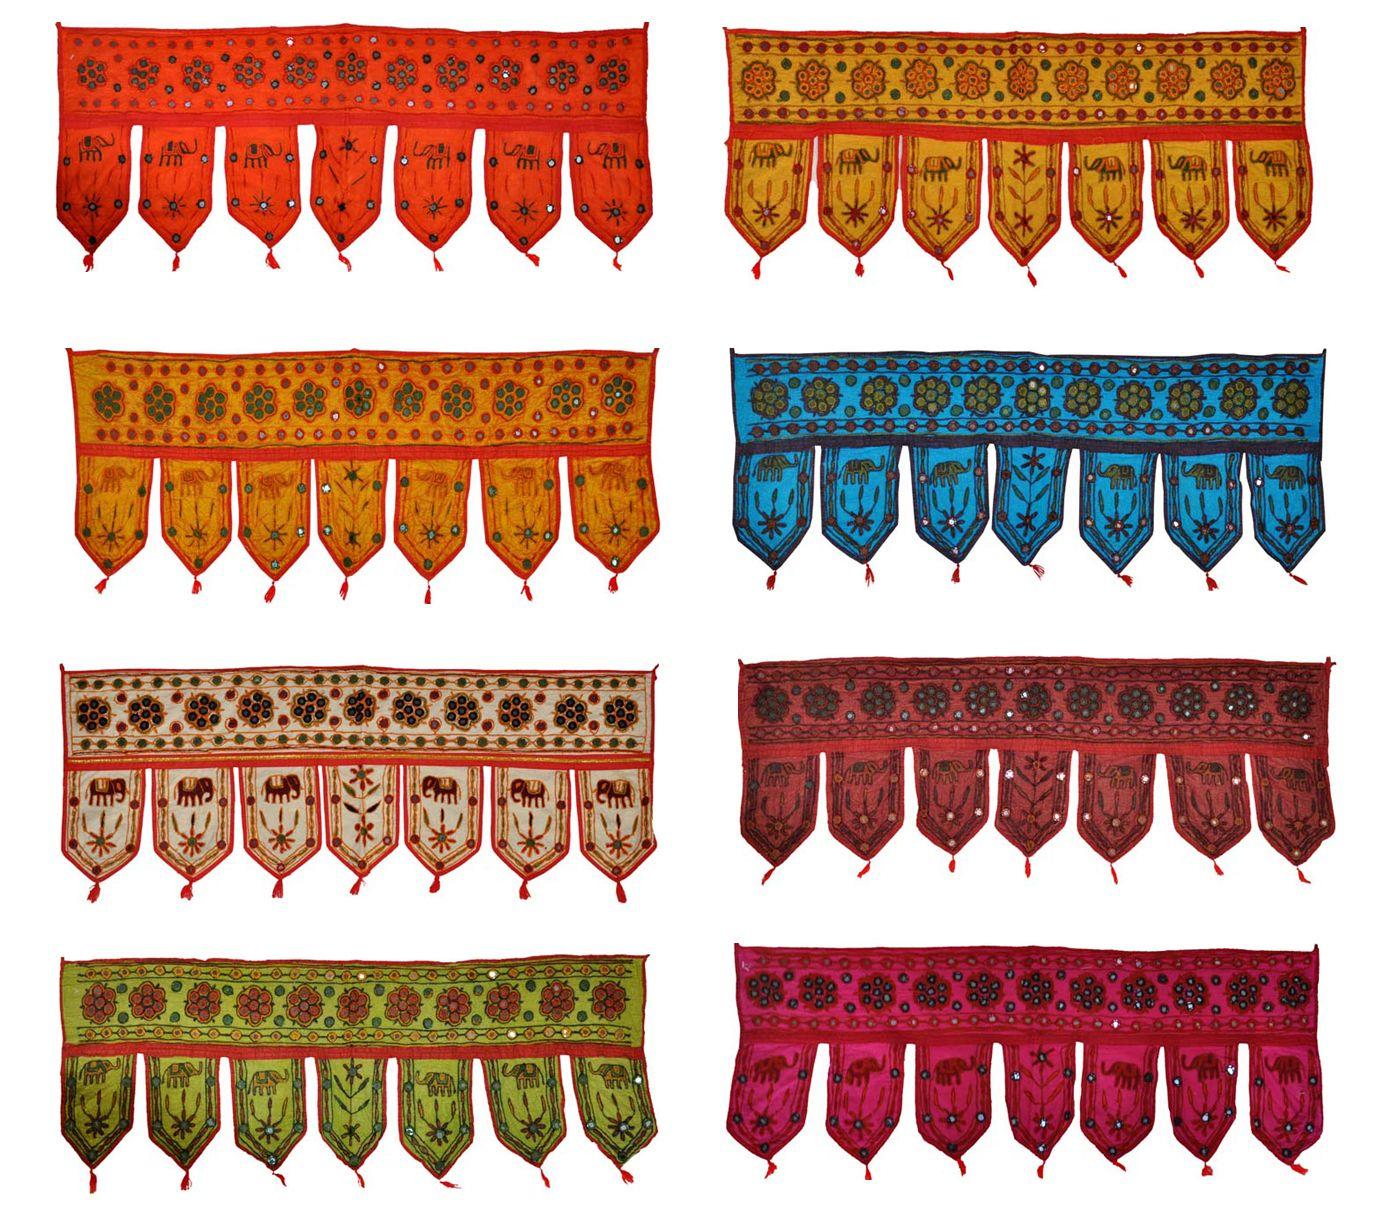 Indian Cotton Door Hanging Embroidered Toran Window Valance 10 Pcs Lot Bds Ehs Indian Doors Elephant Decor Handmade Mirrors